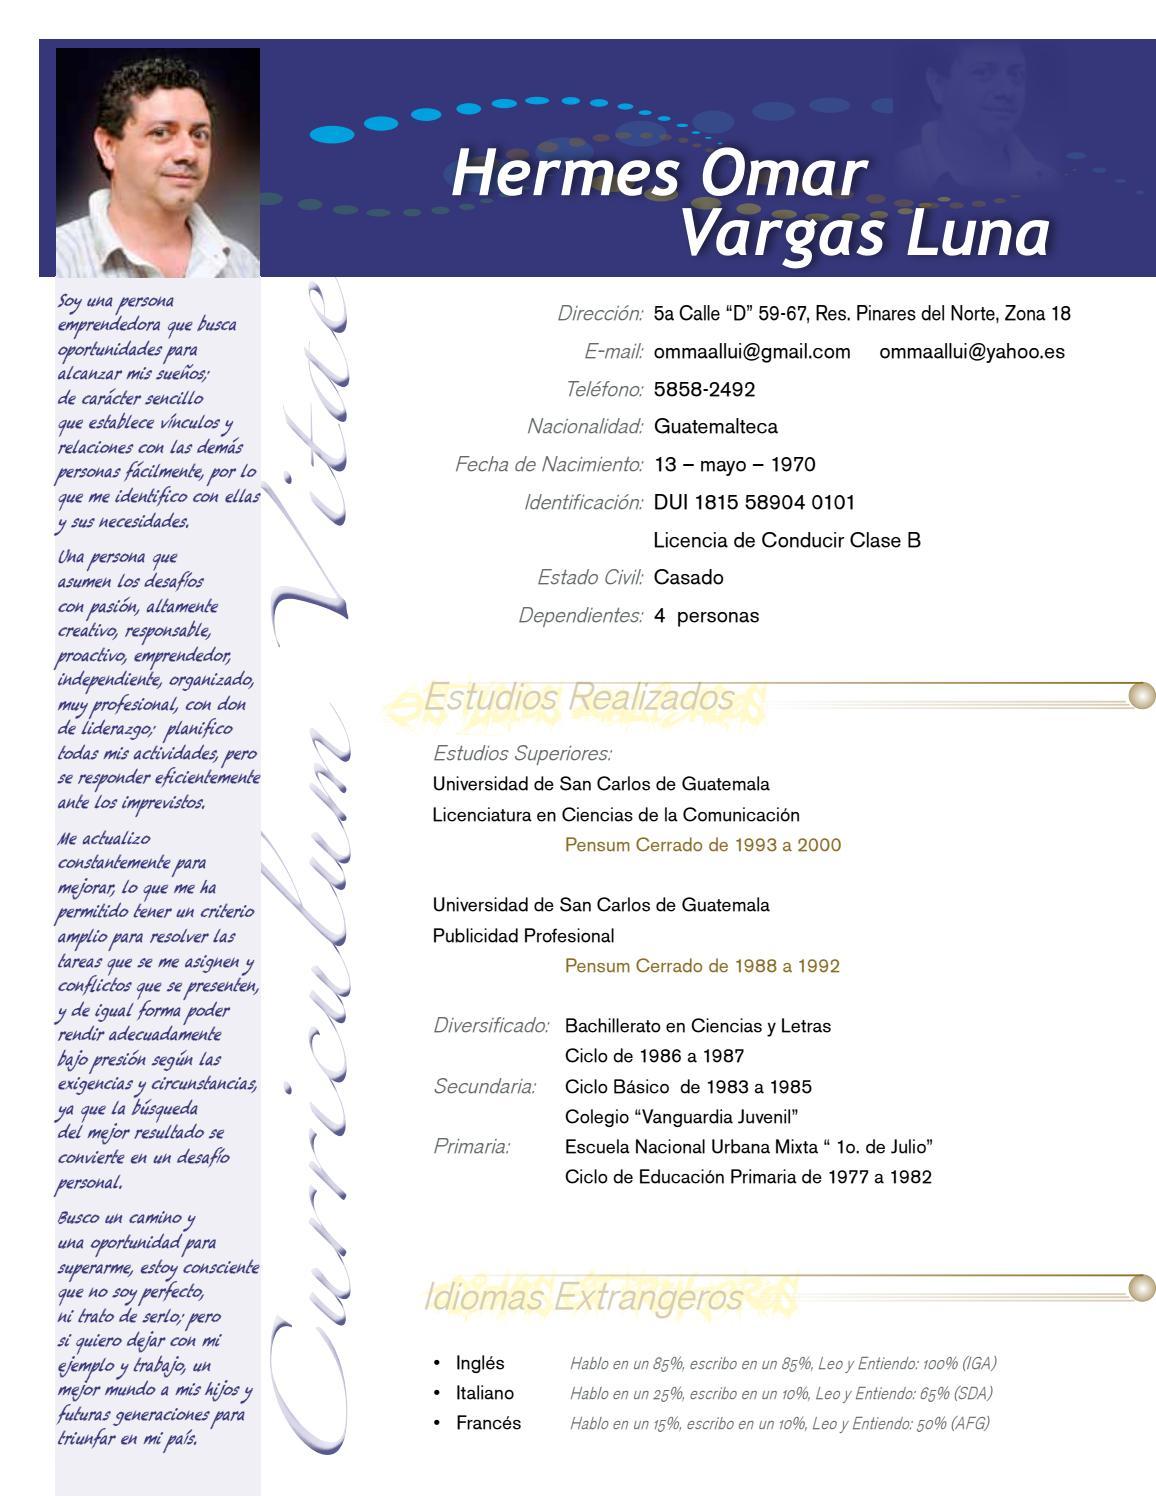 Curriculum vitae personal by Omar Vargas - issuu